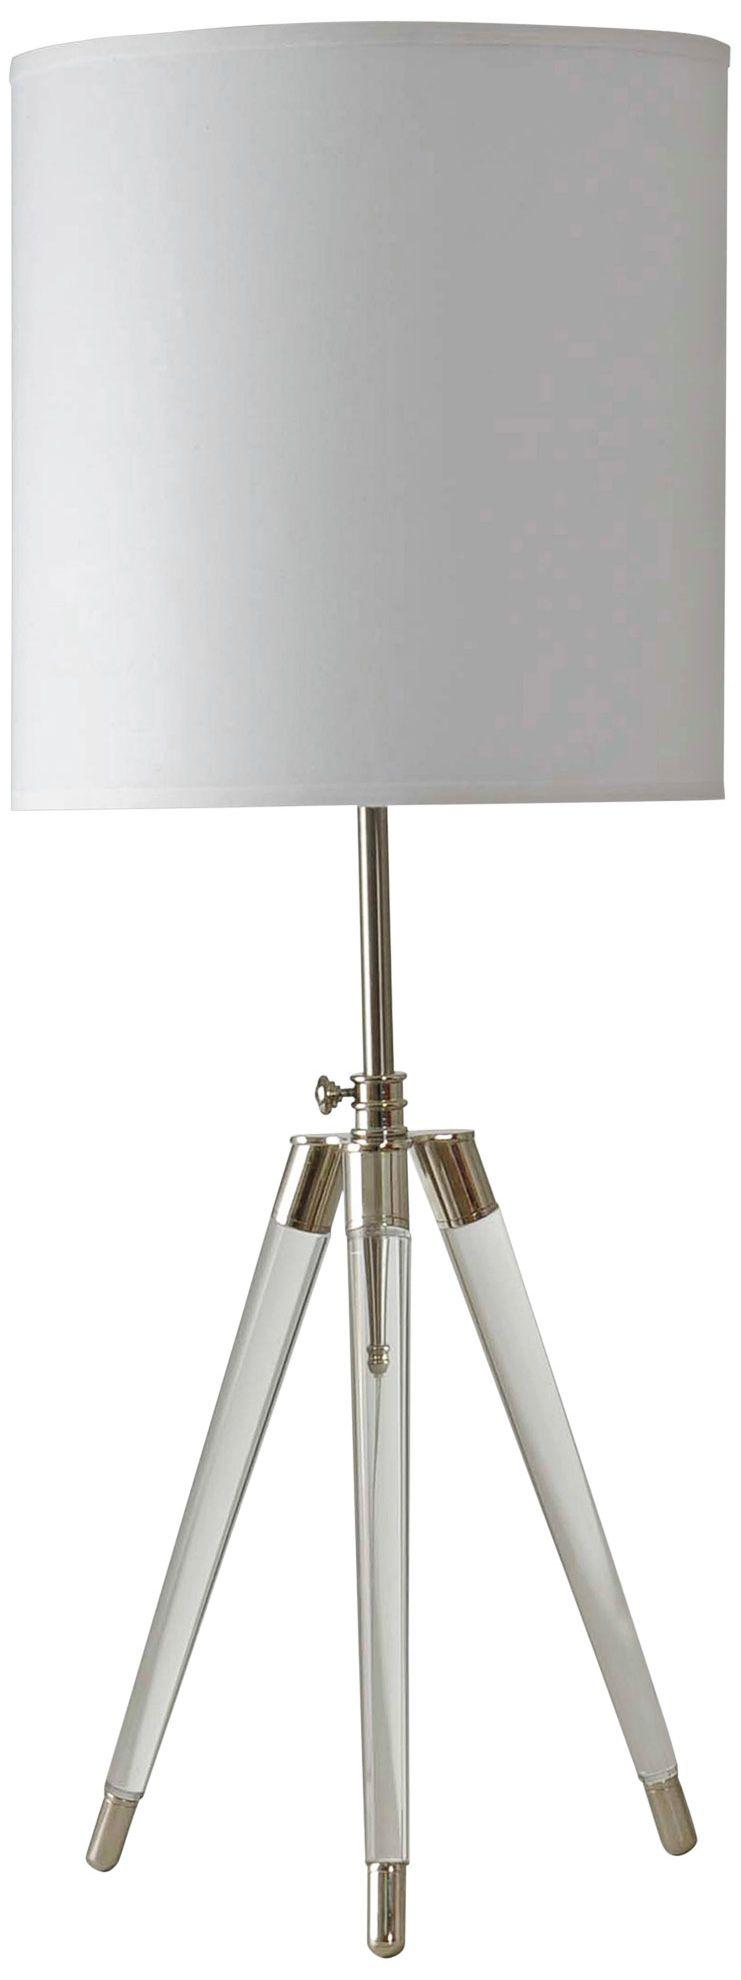 Superbe Crystal Tripod Table Lamp With White Hardback Fabric Shade